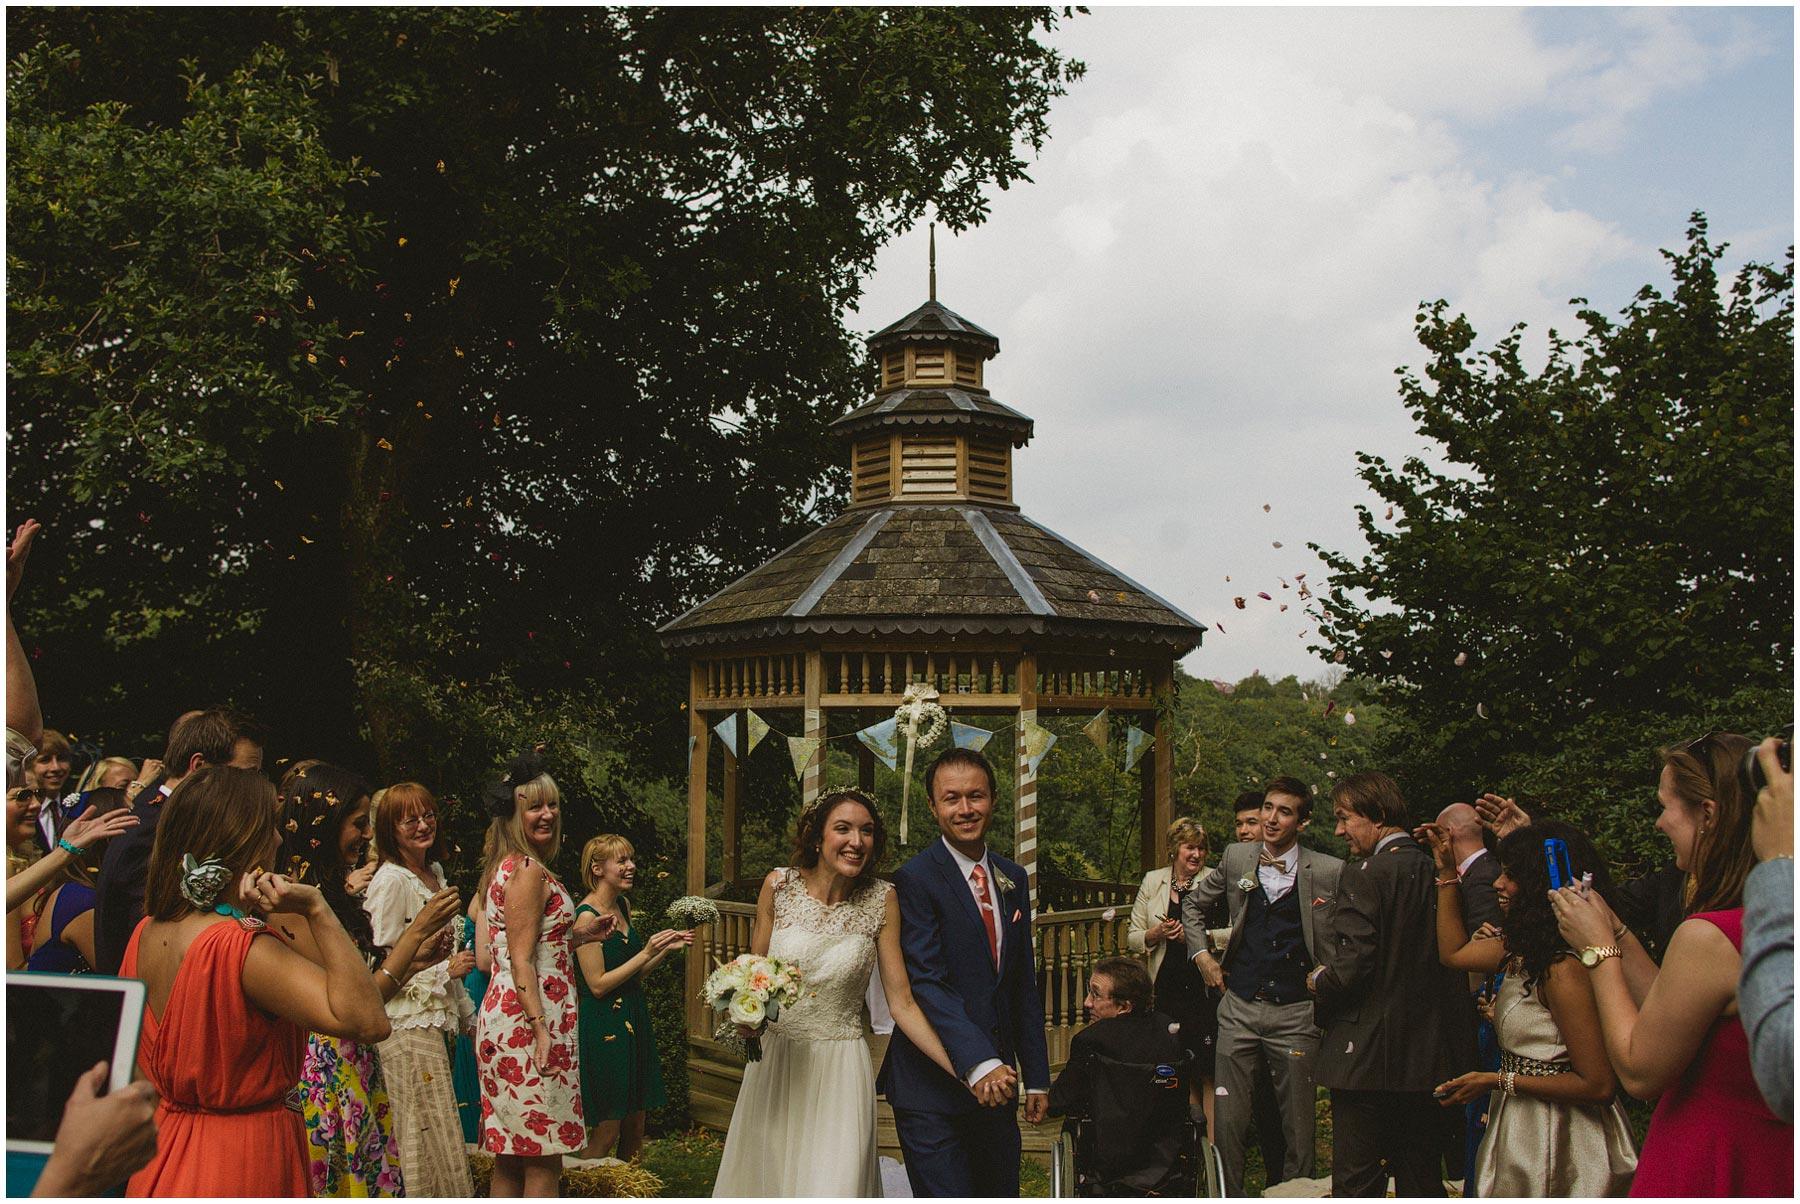 Colehayes-Park-Wedding-Photography_0094